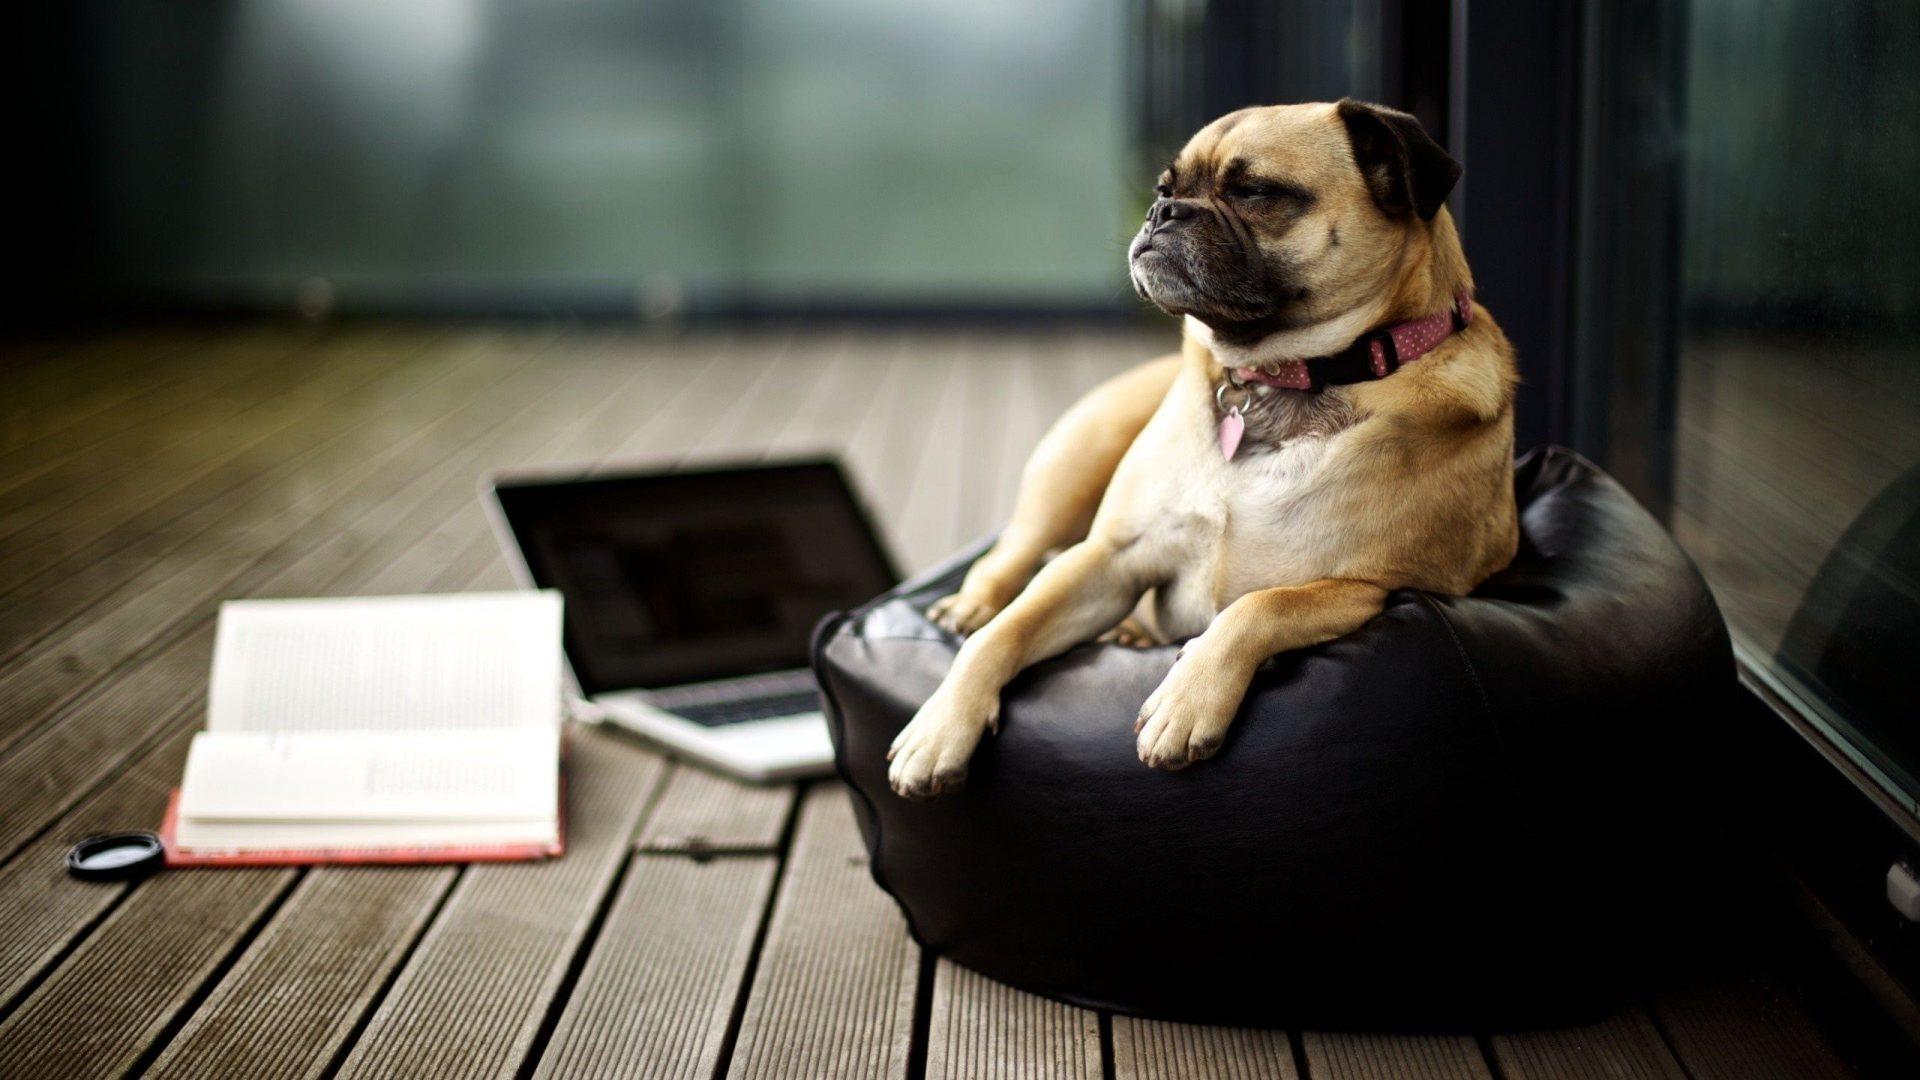 Business Dog Full Hd Desktop Wallpapers 1080p